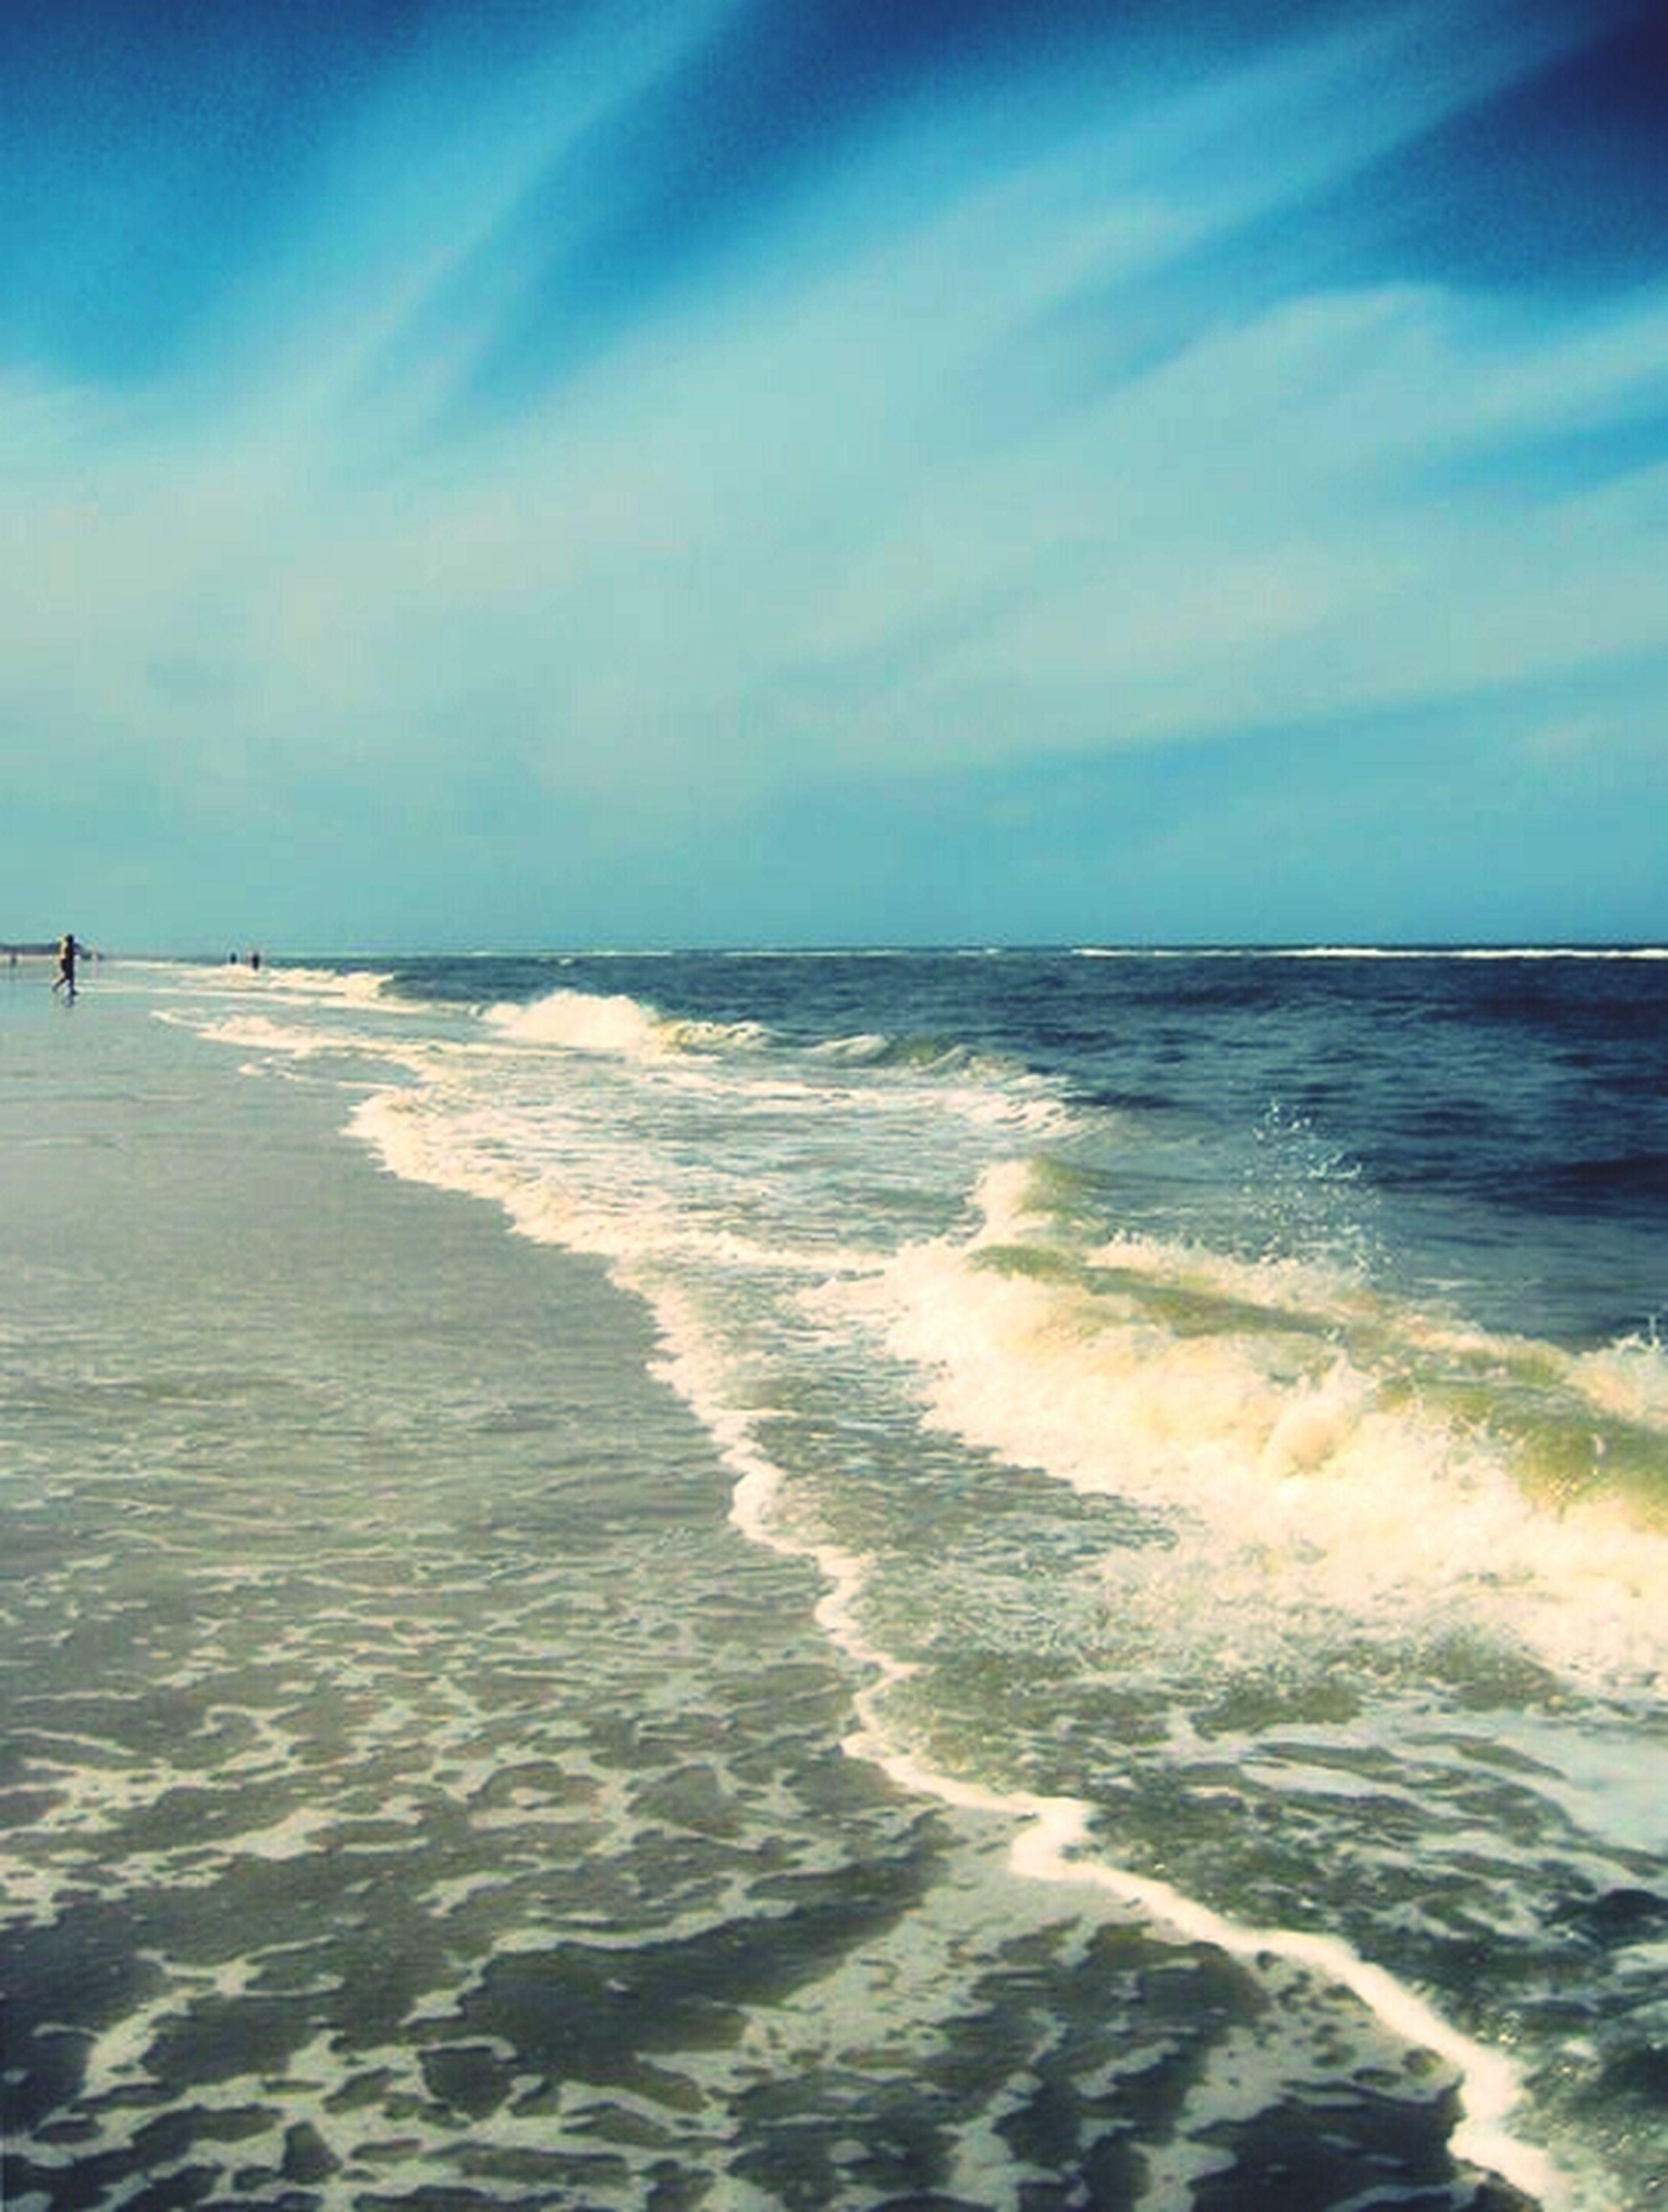 sea, water, beach, horizon over water, sky, shore, scenics, sand, tranquil scene, beauty in nature, wave, tranquility, surf, nature, cloud - sky, blue, idyllic, coastline, seascape, cloud